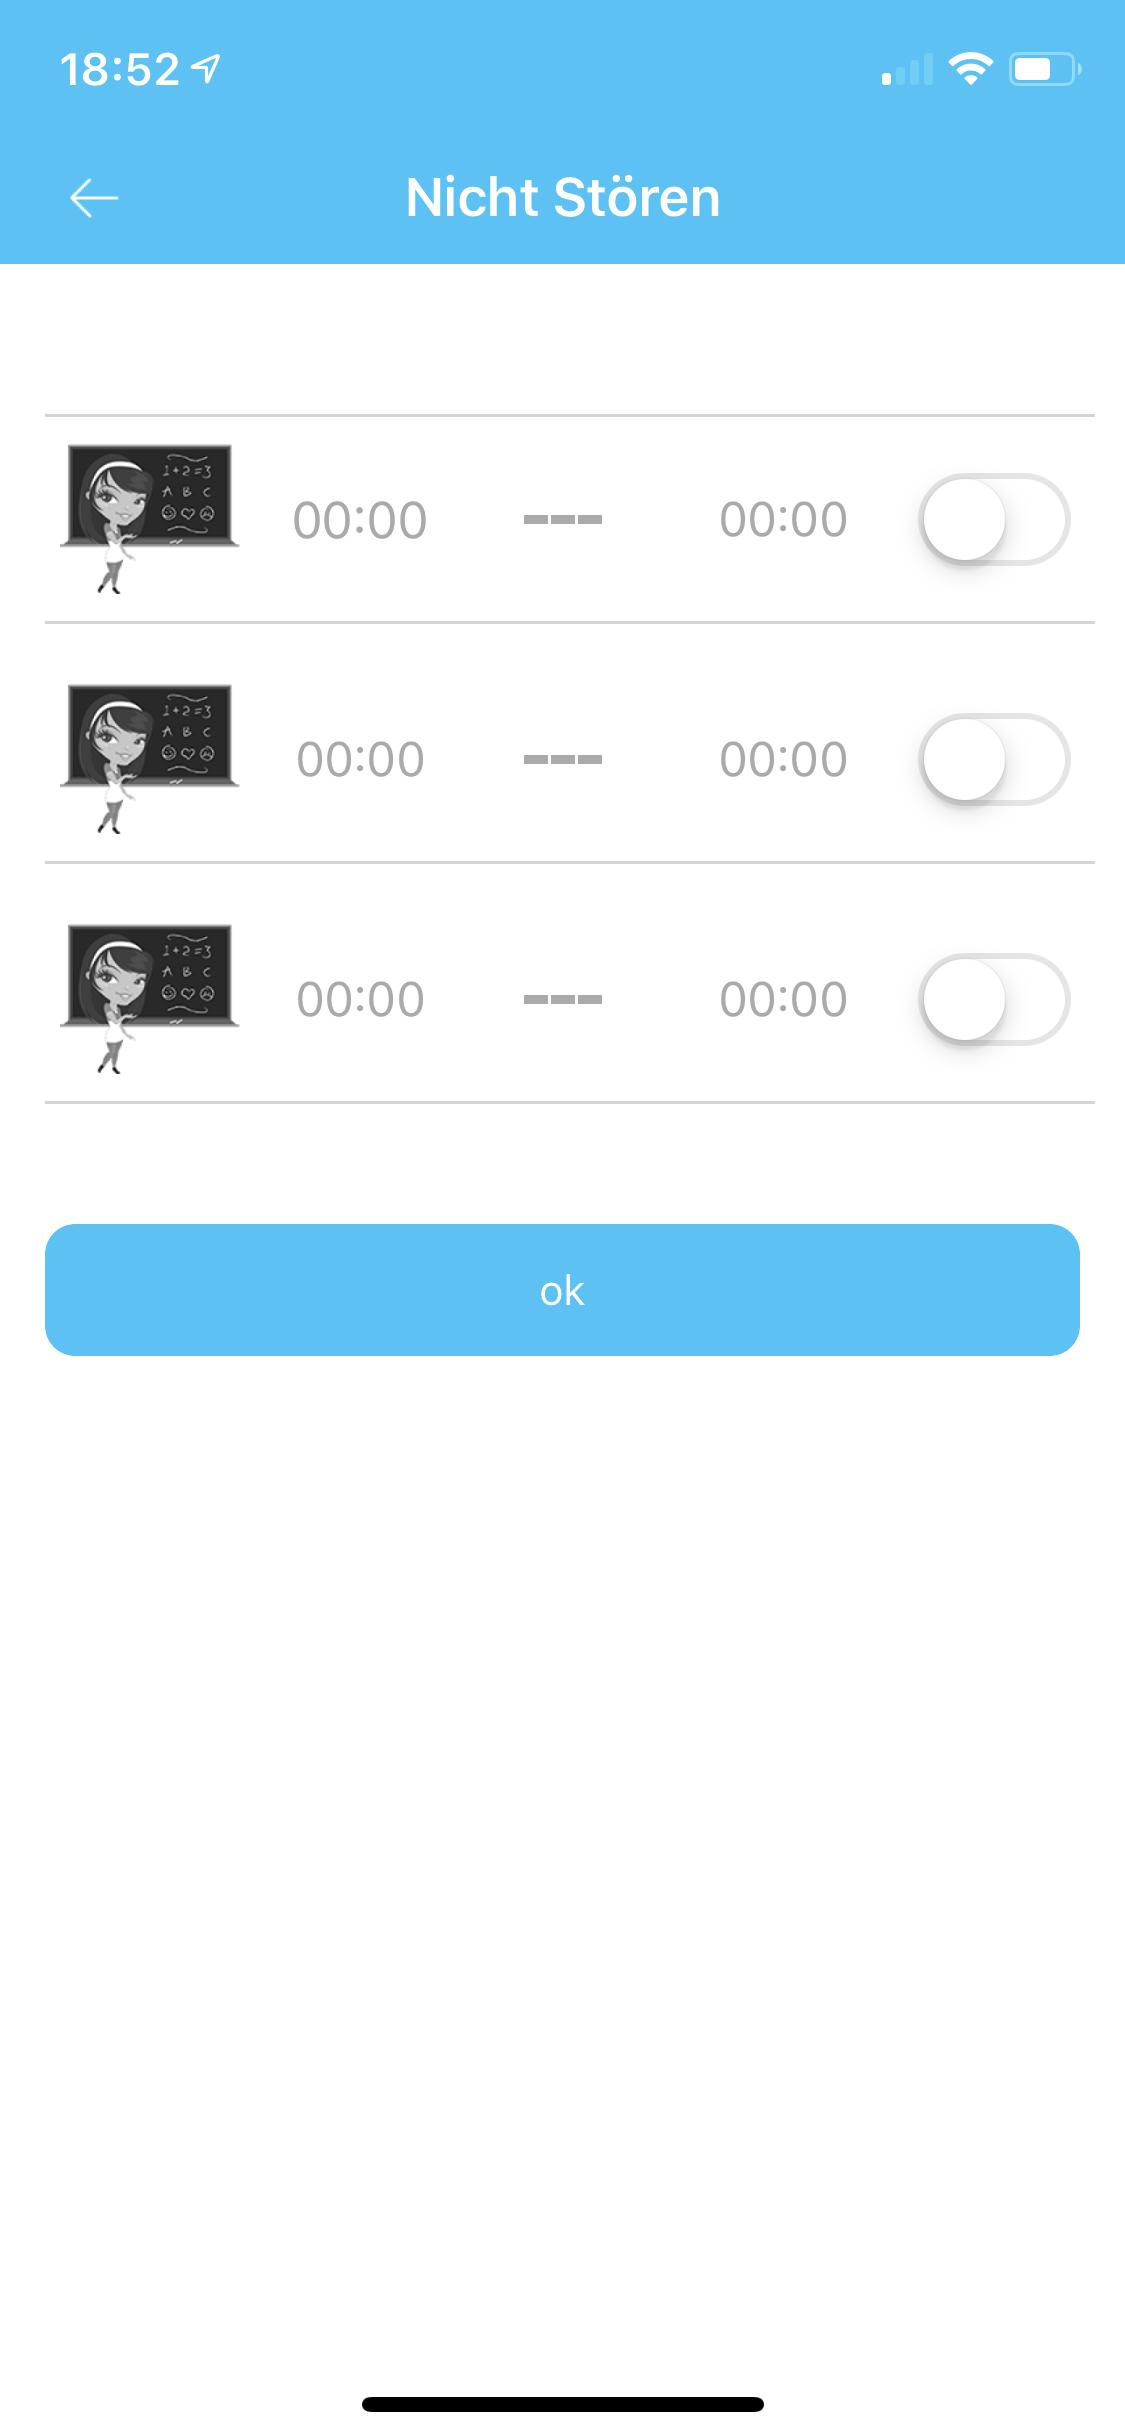 SE-Tracker-App nicht stören Funktion